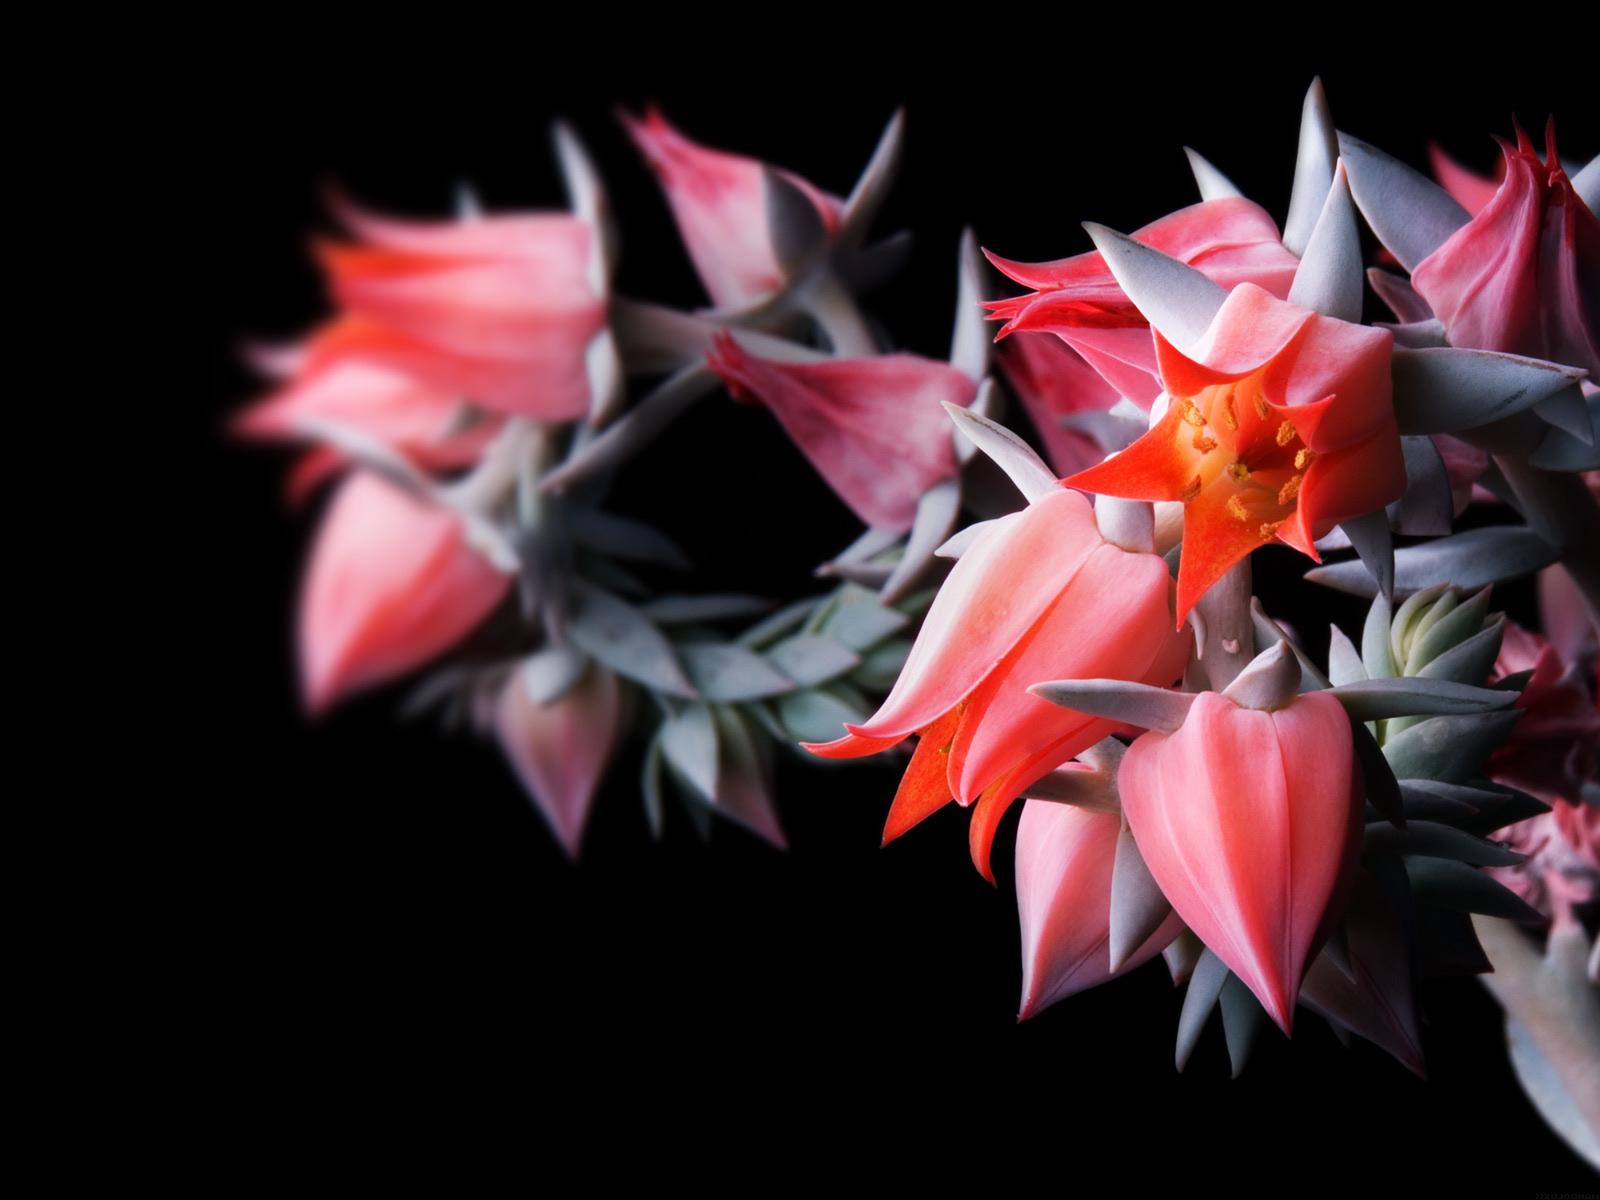 50] Black Flower Wallpaper on WallpaperSafari 1600x1200